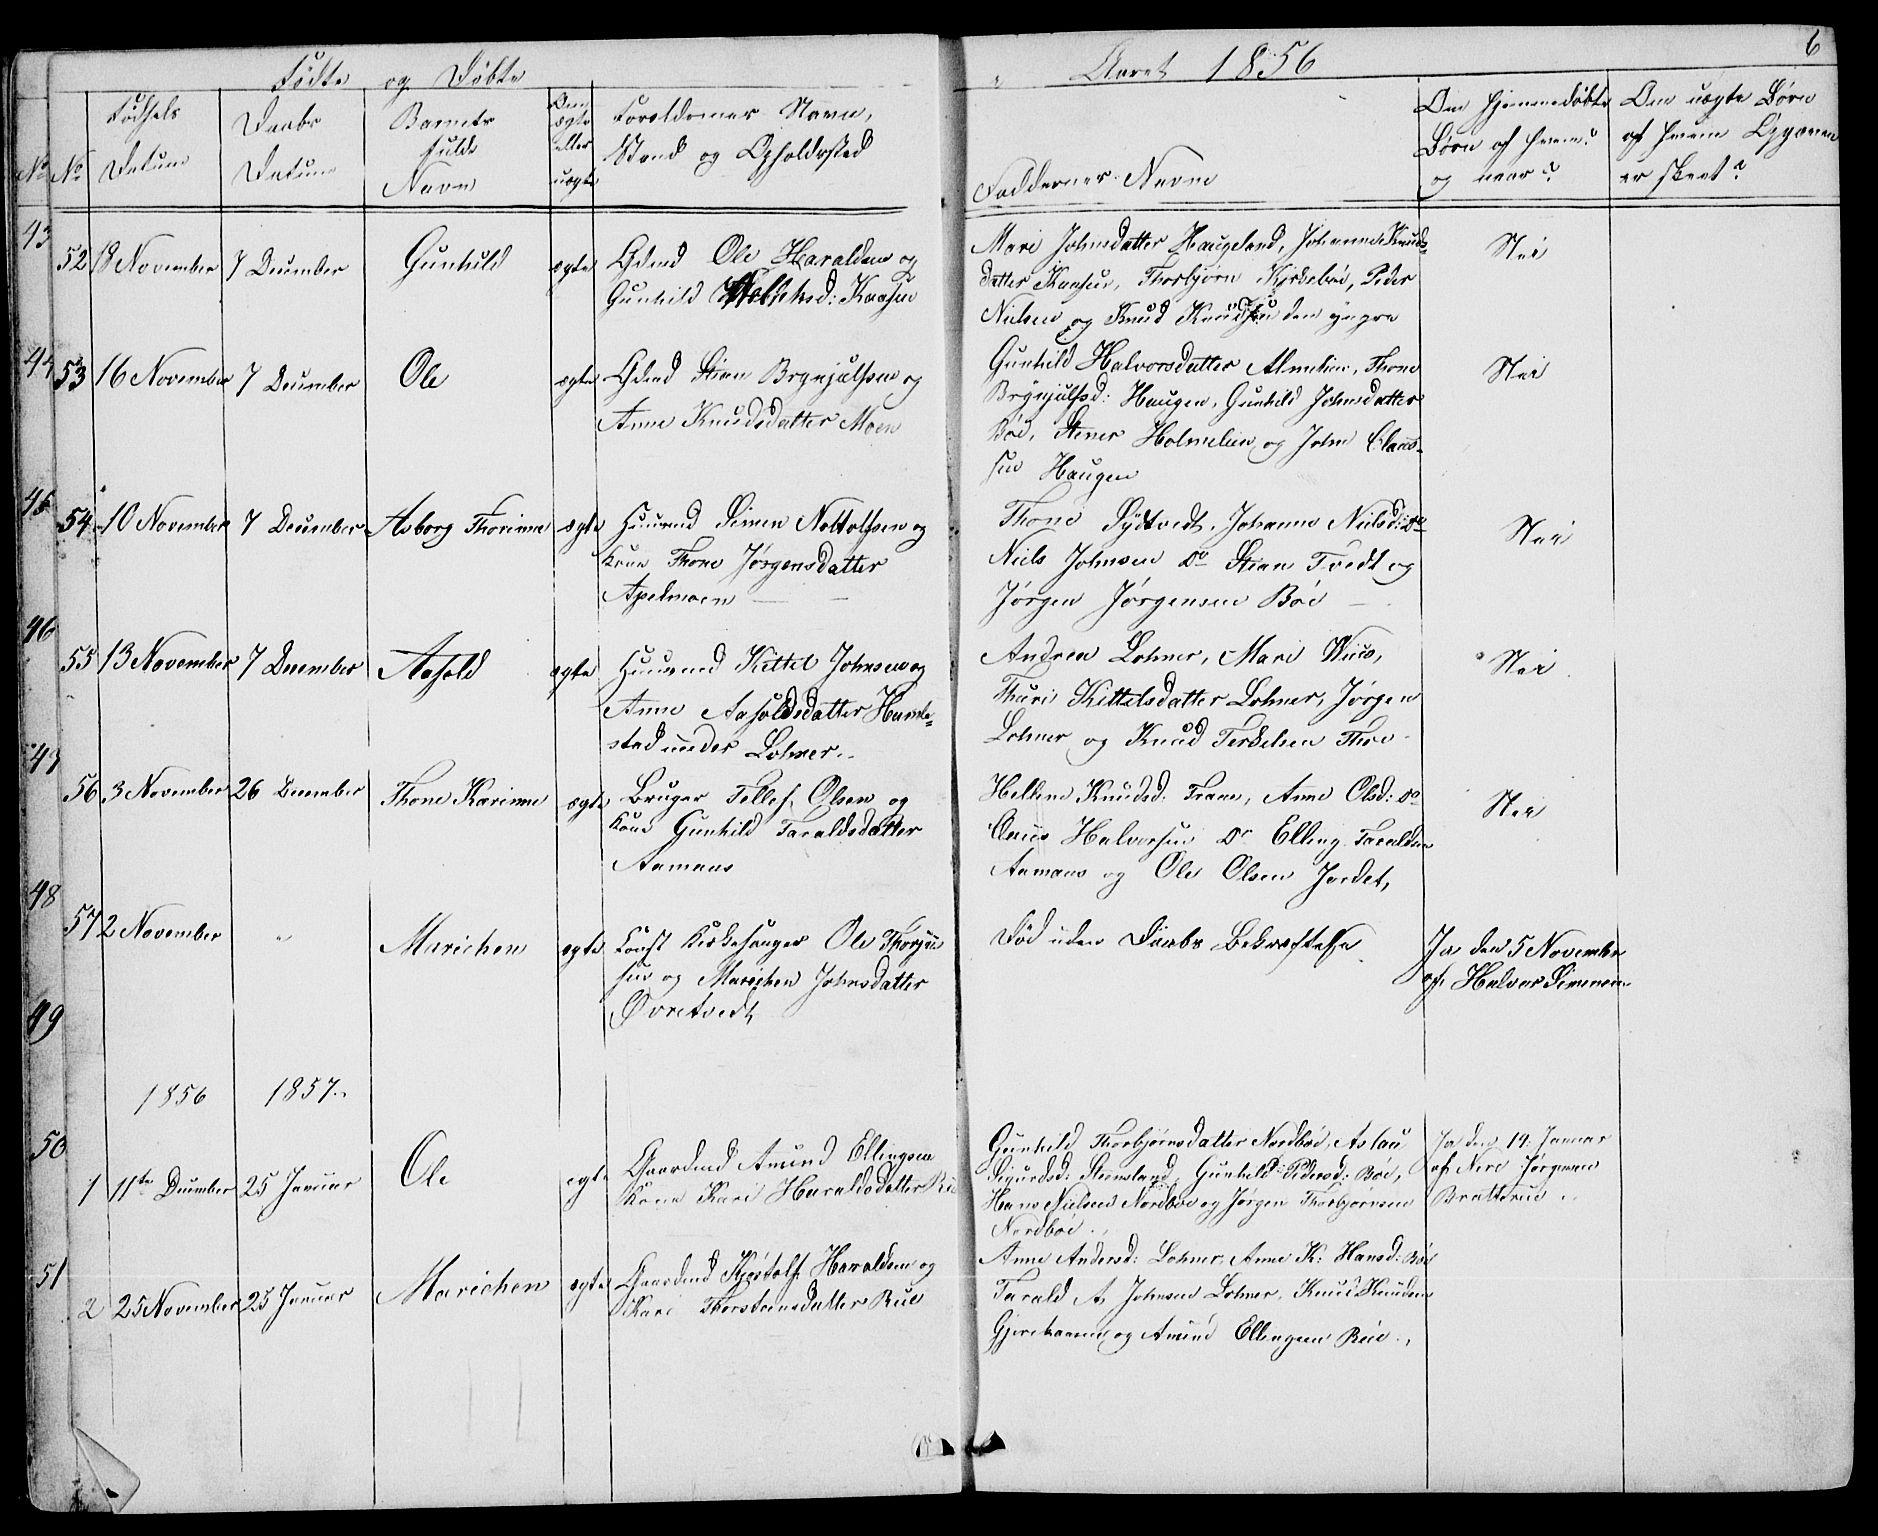 SAKO, Drangedal kirkebøker, G/Gb/L0001: Klokkerbok nr. II 1, 1856-1894, s. 6